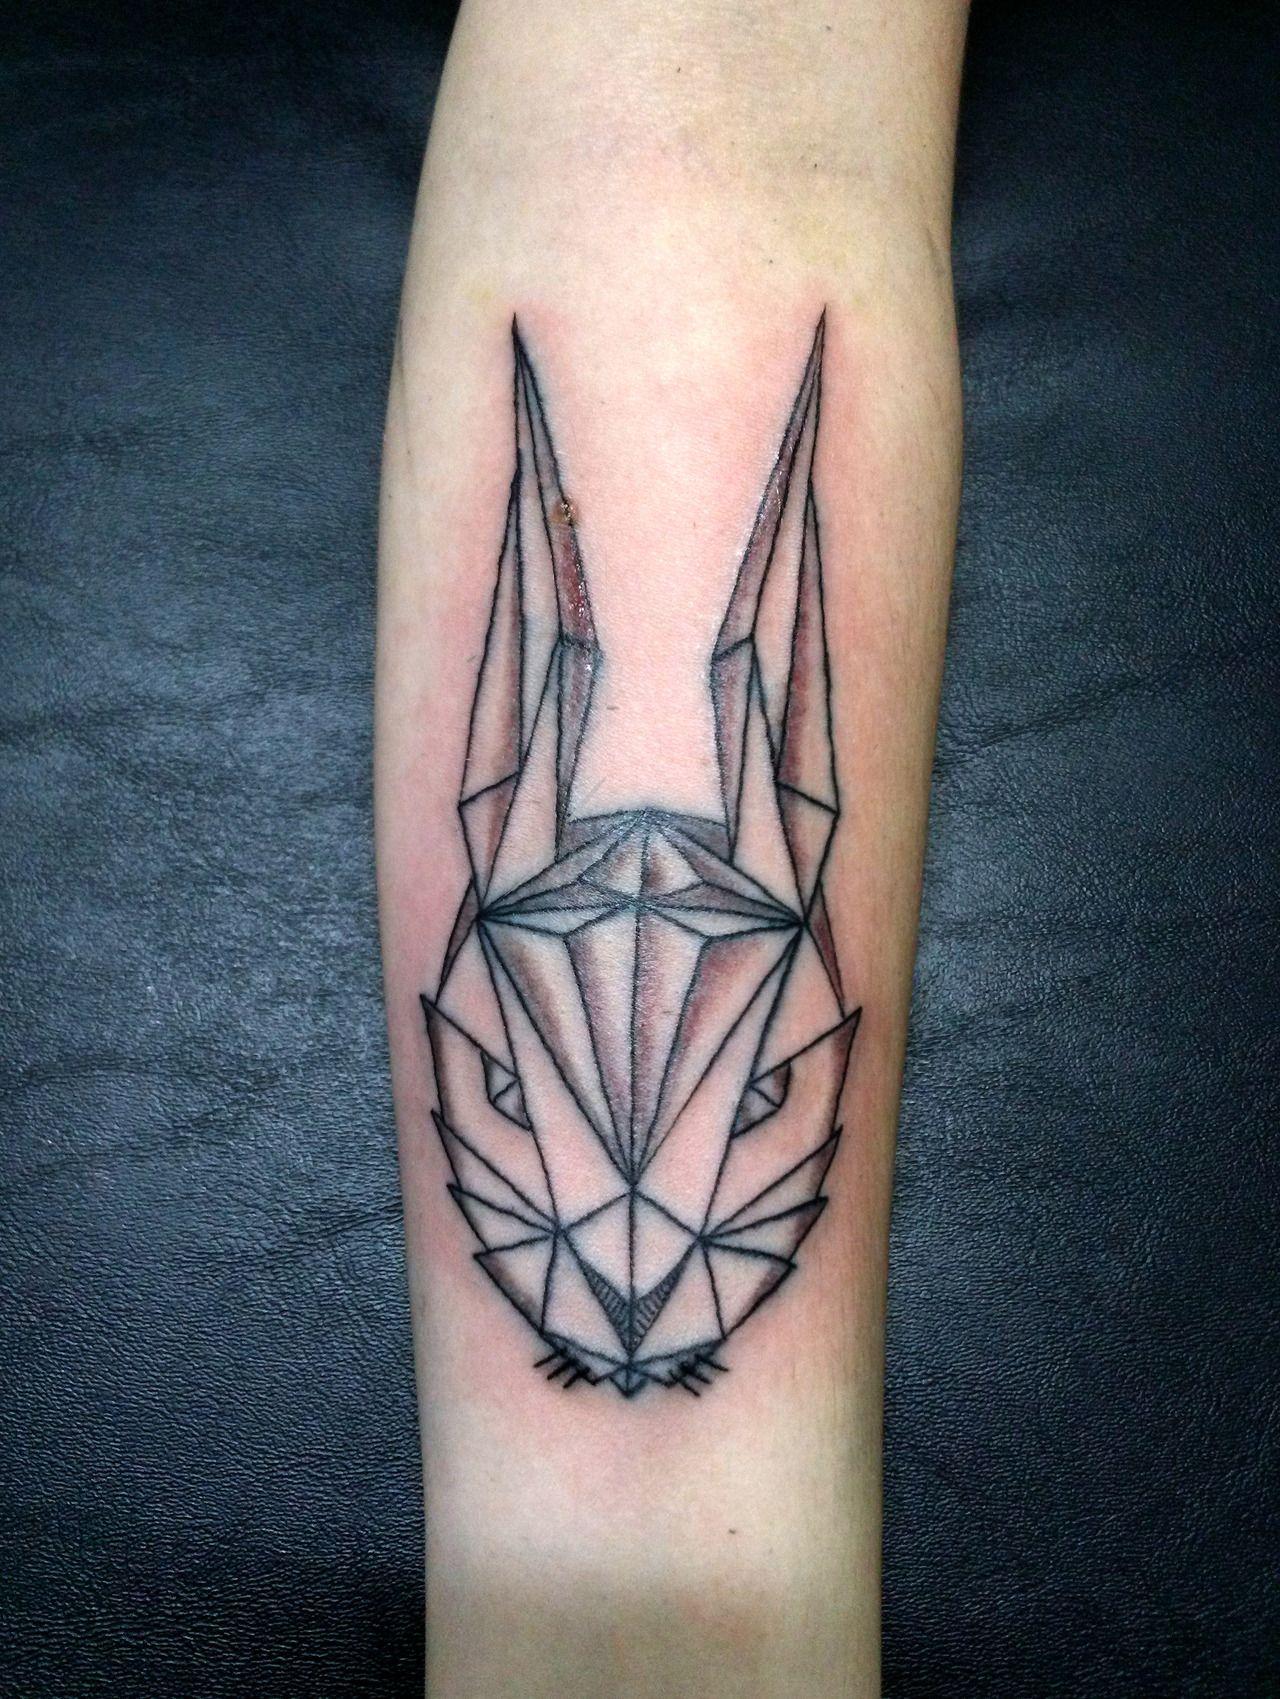 fuckyeahtattoos:  Little rabbit geometric tattoo I did last yearfb: /akaua.pasqualinstagram: @Amanda Snelson Andersonã Pasqual